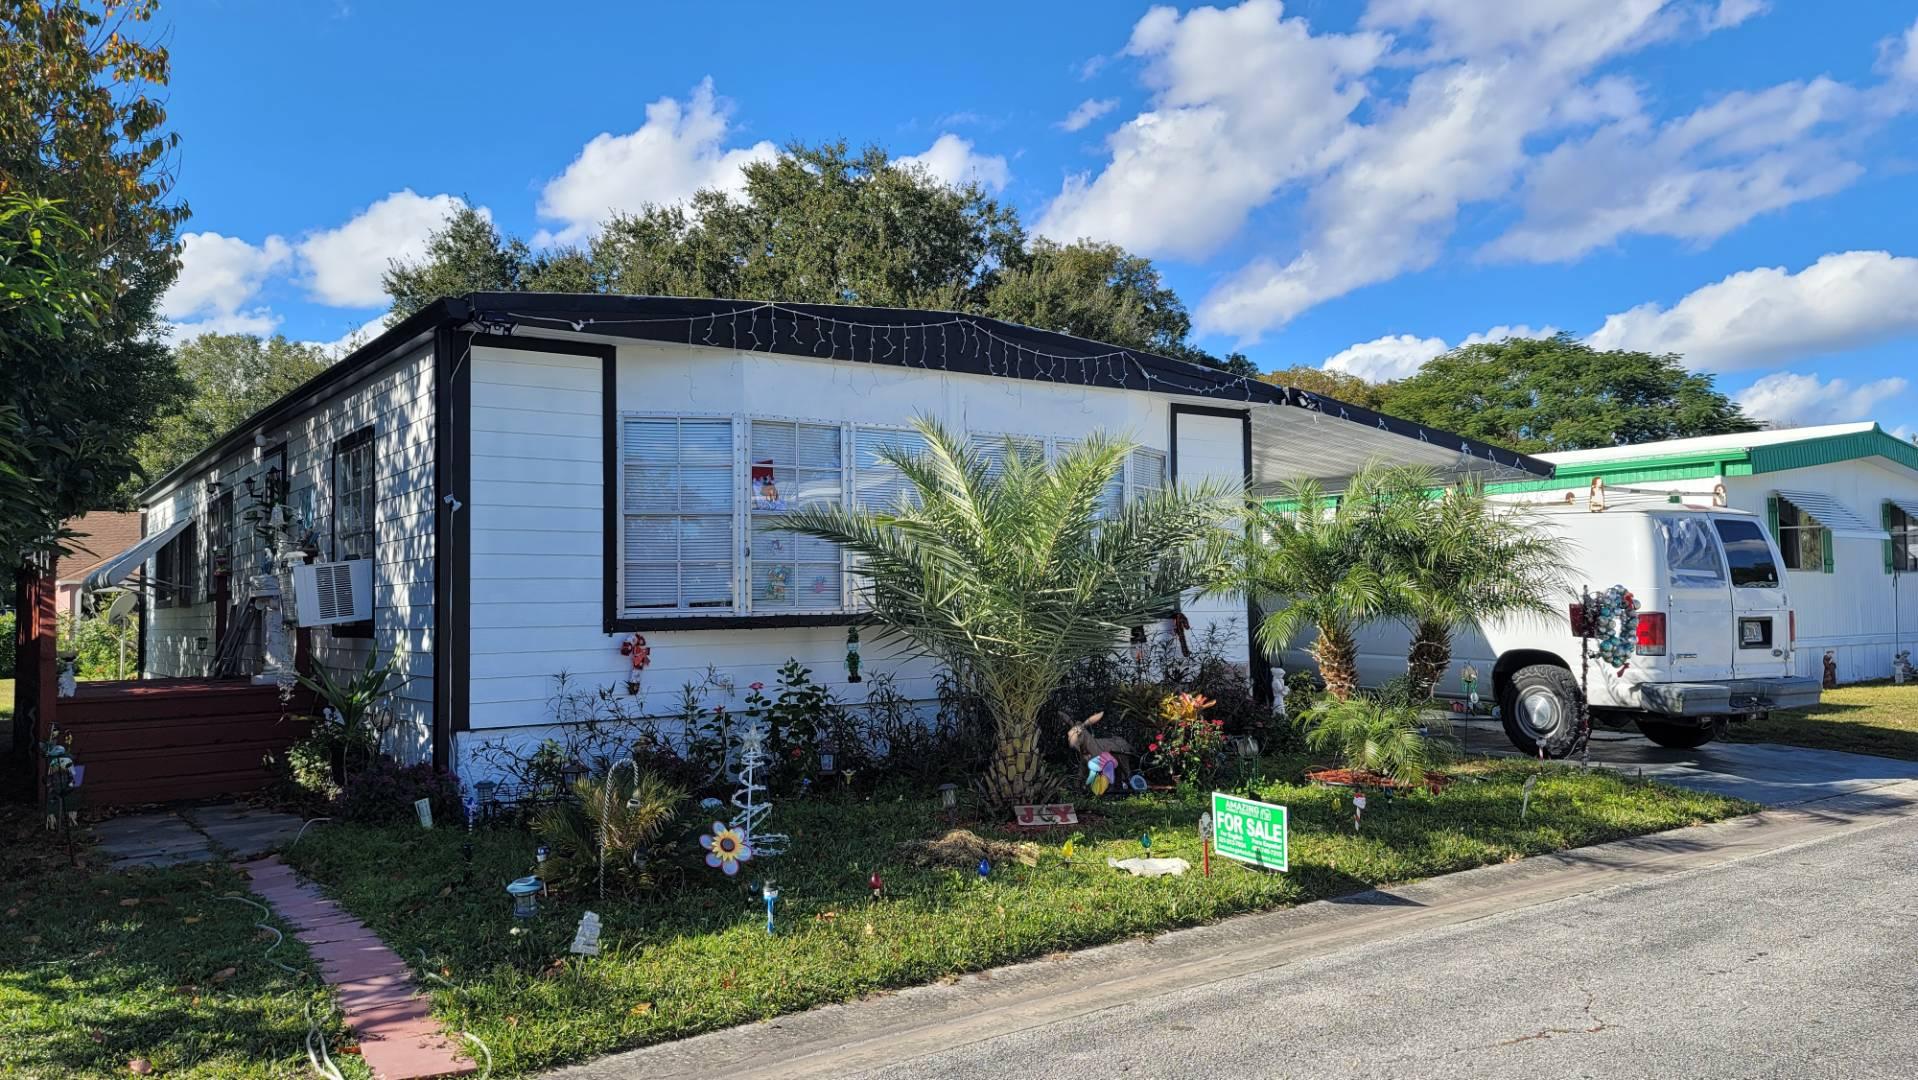 2908 Bronco lane, ORLANDO, Florida 32822, ,Single Family,For Sale,2908 Bronco lane,10961599